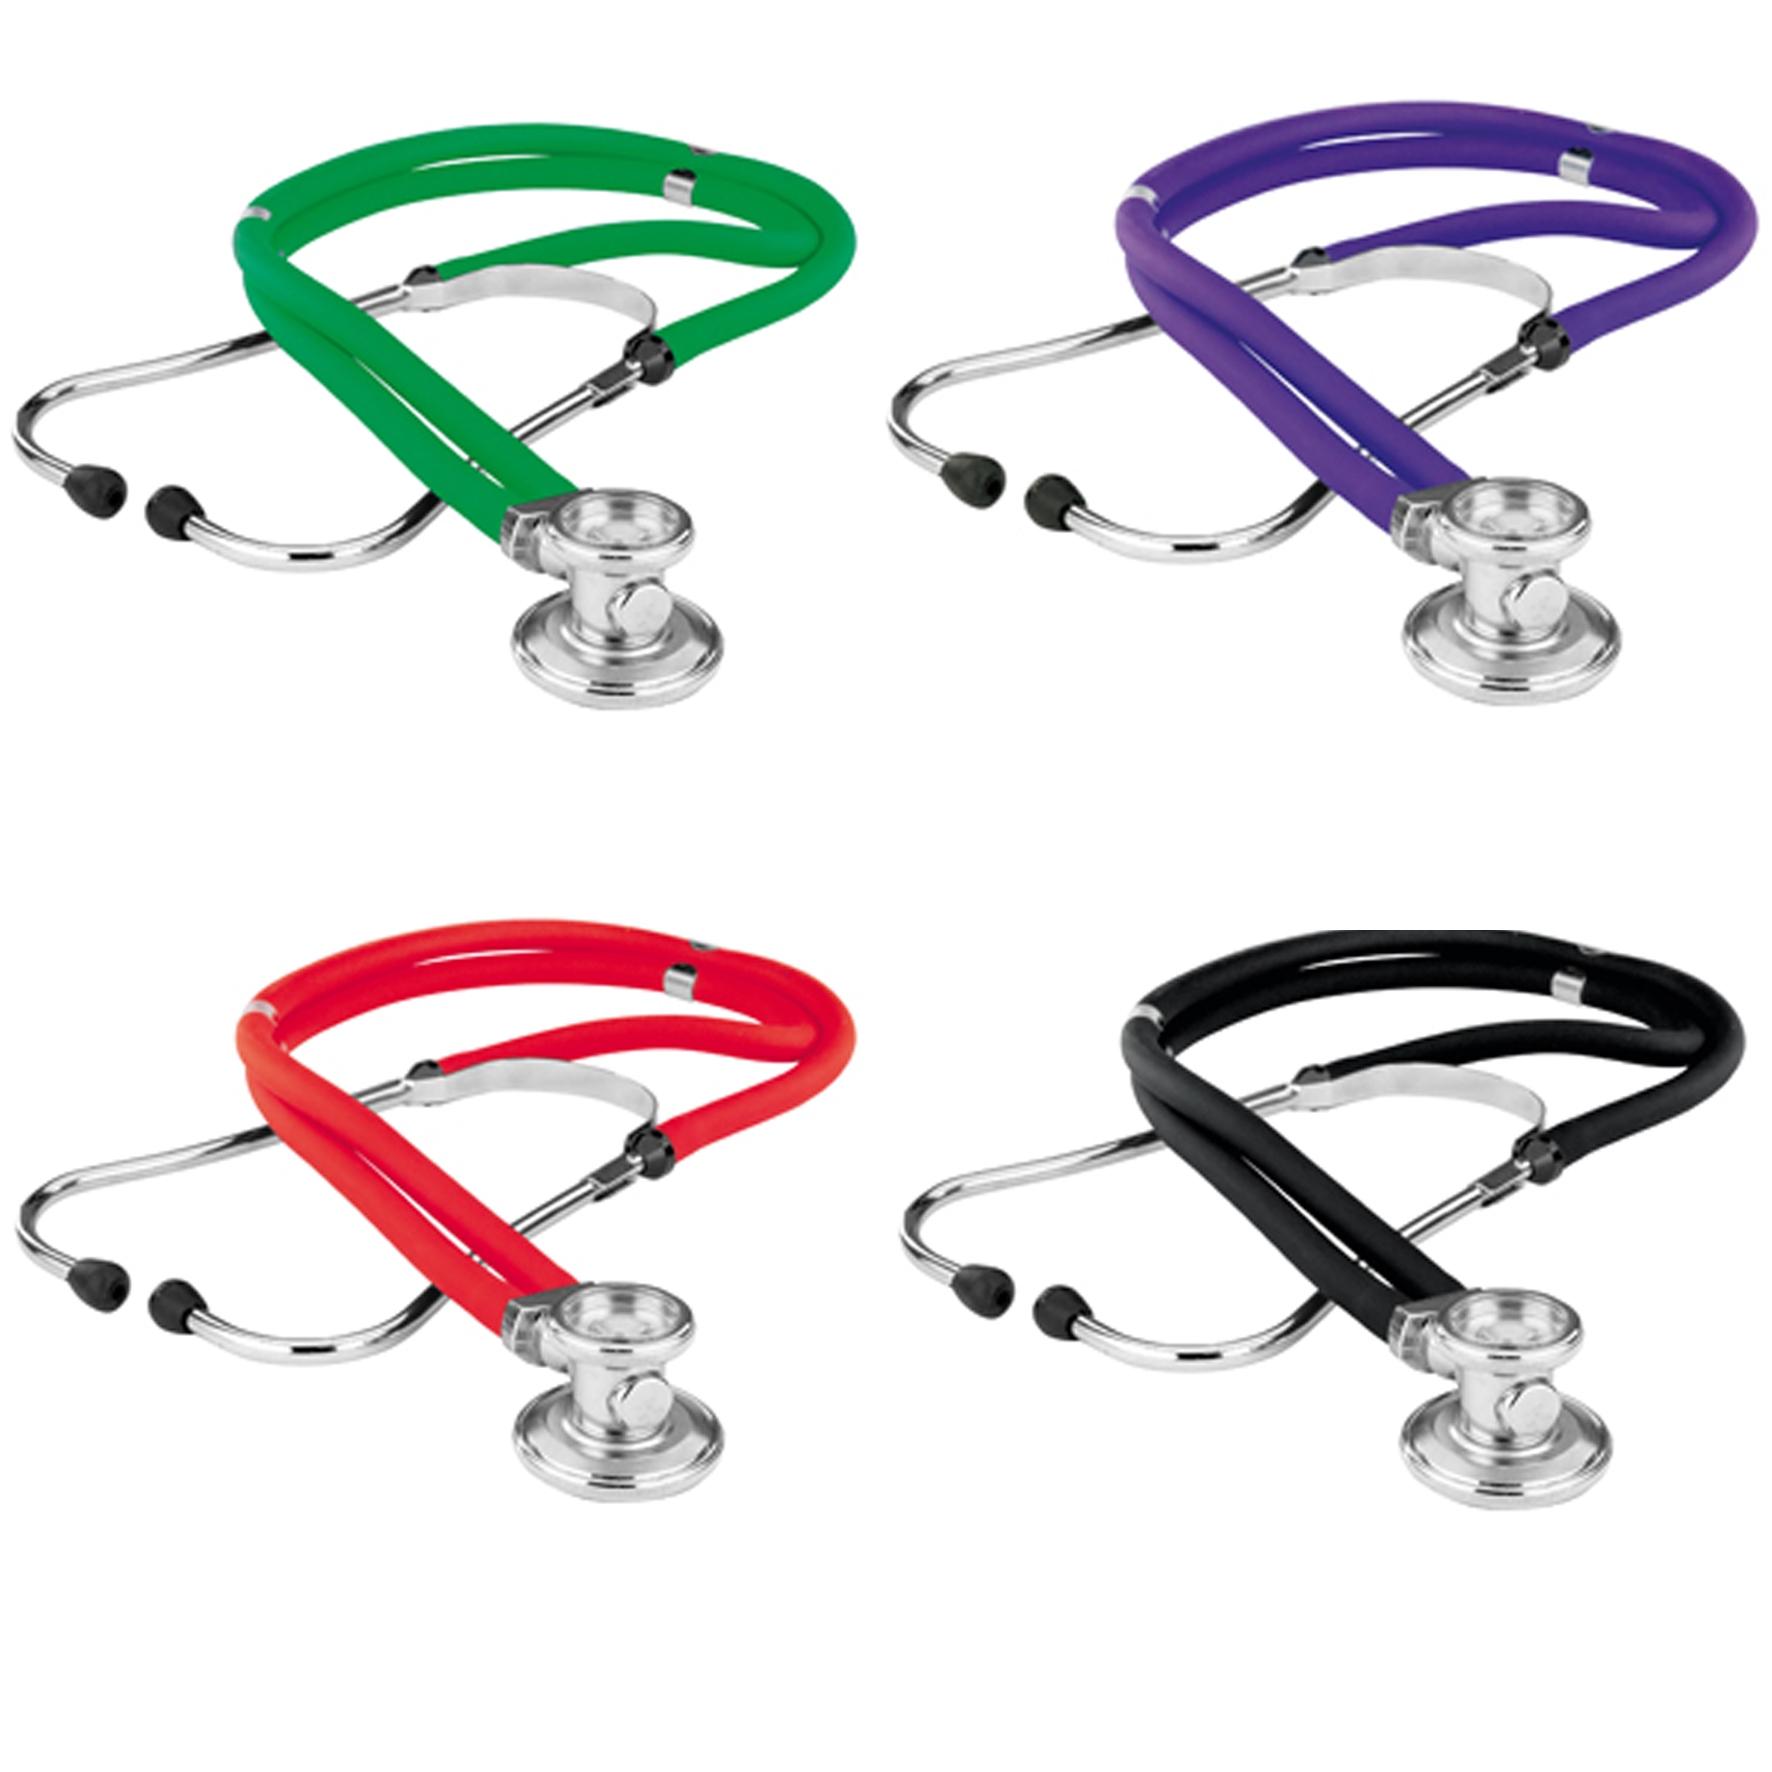 Rapport stethoscopen